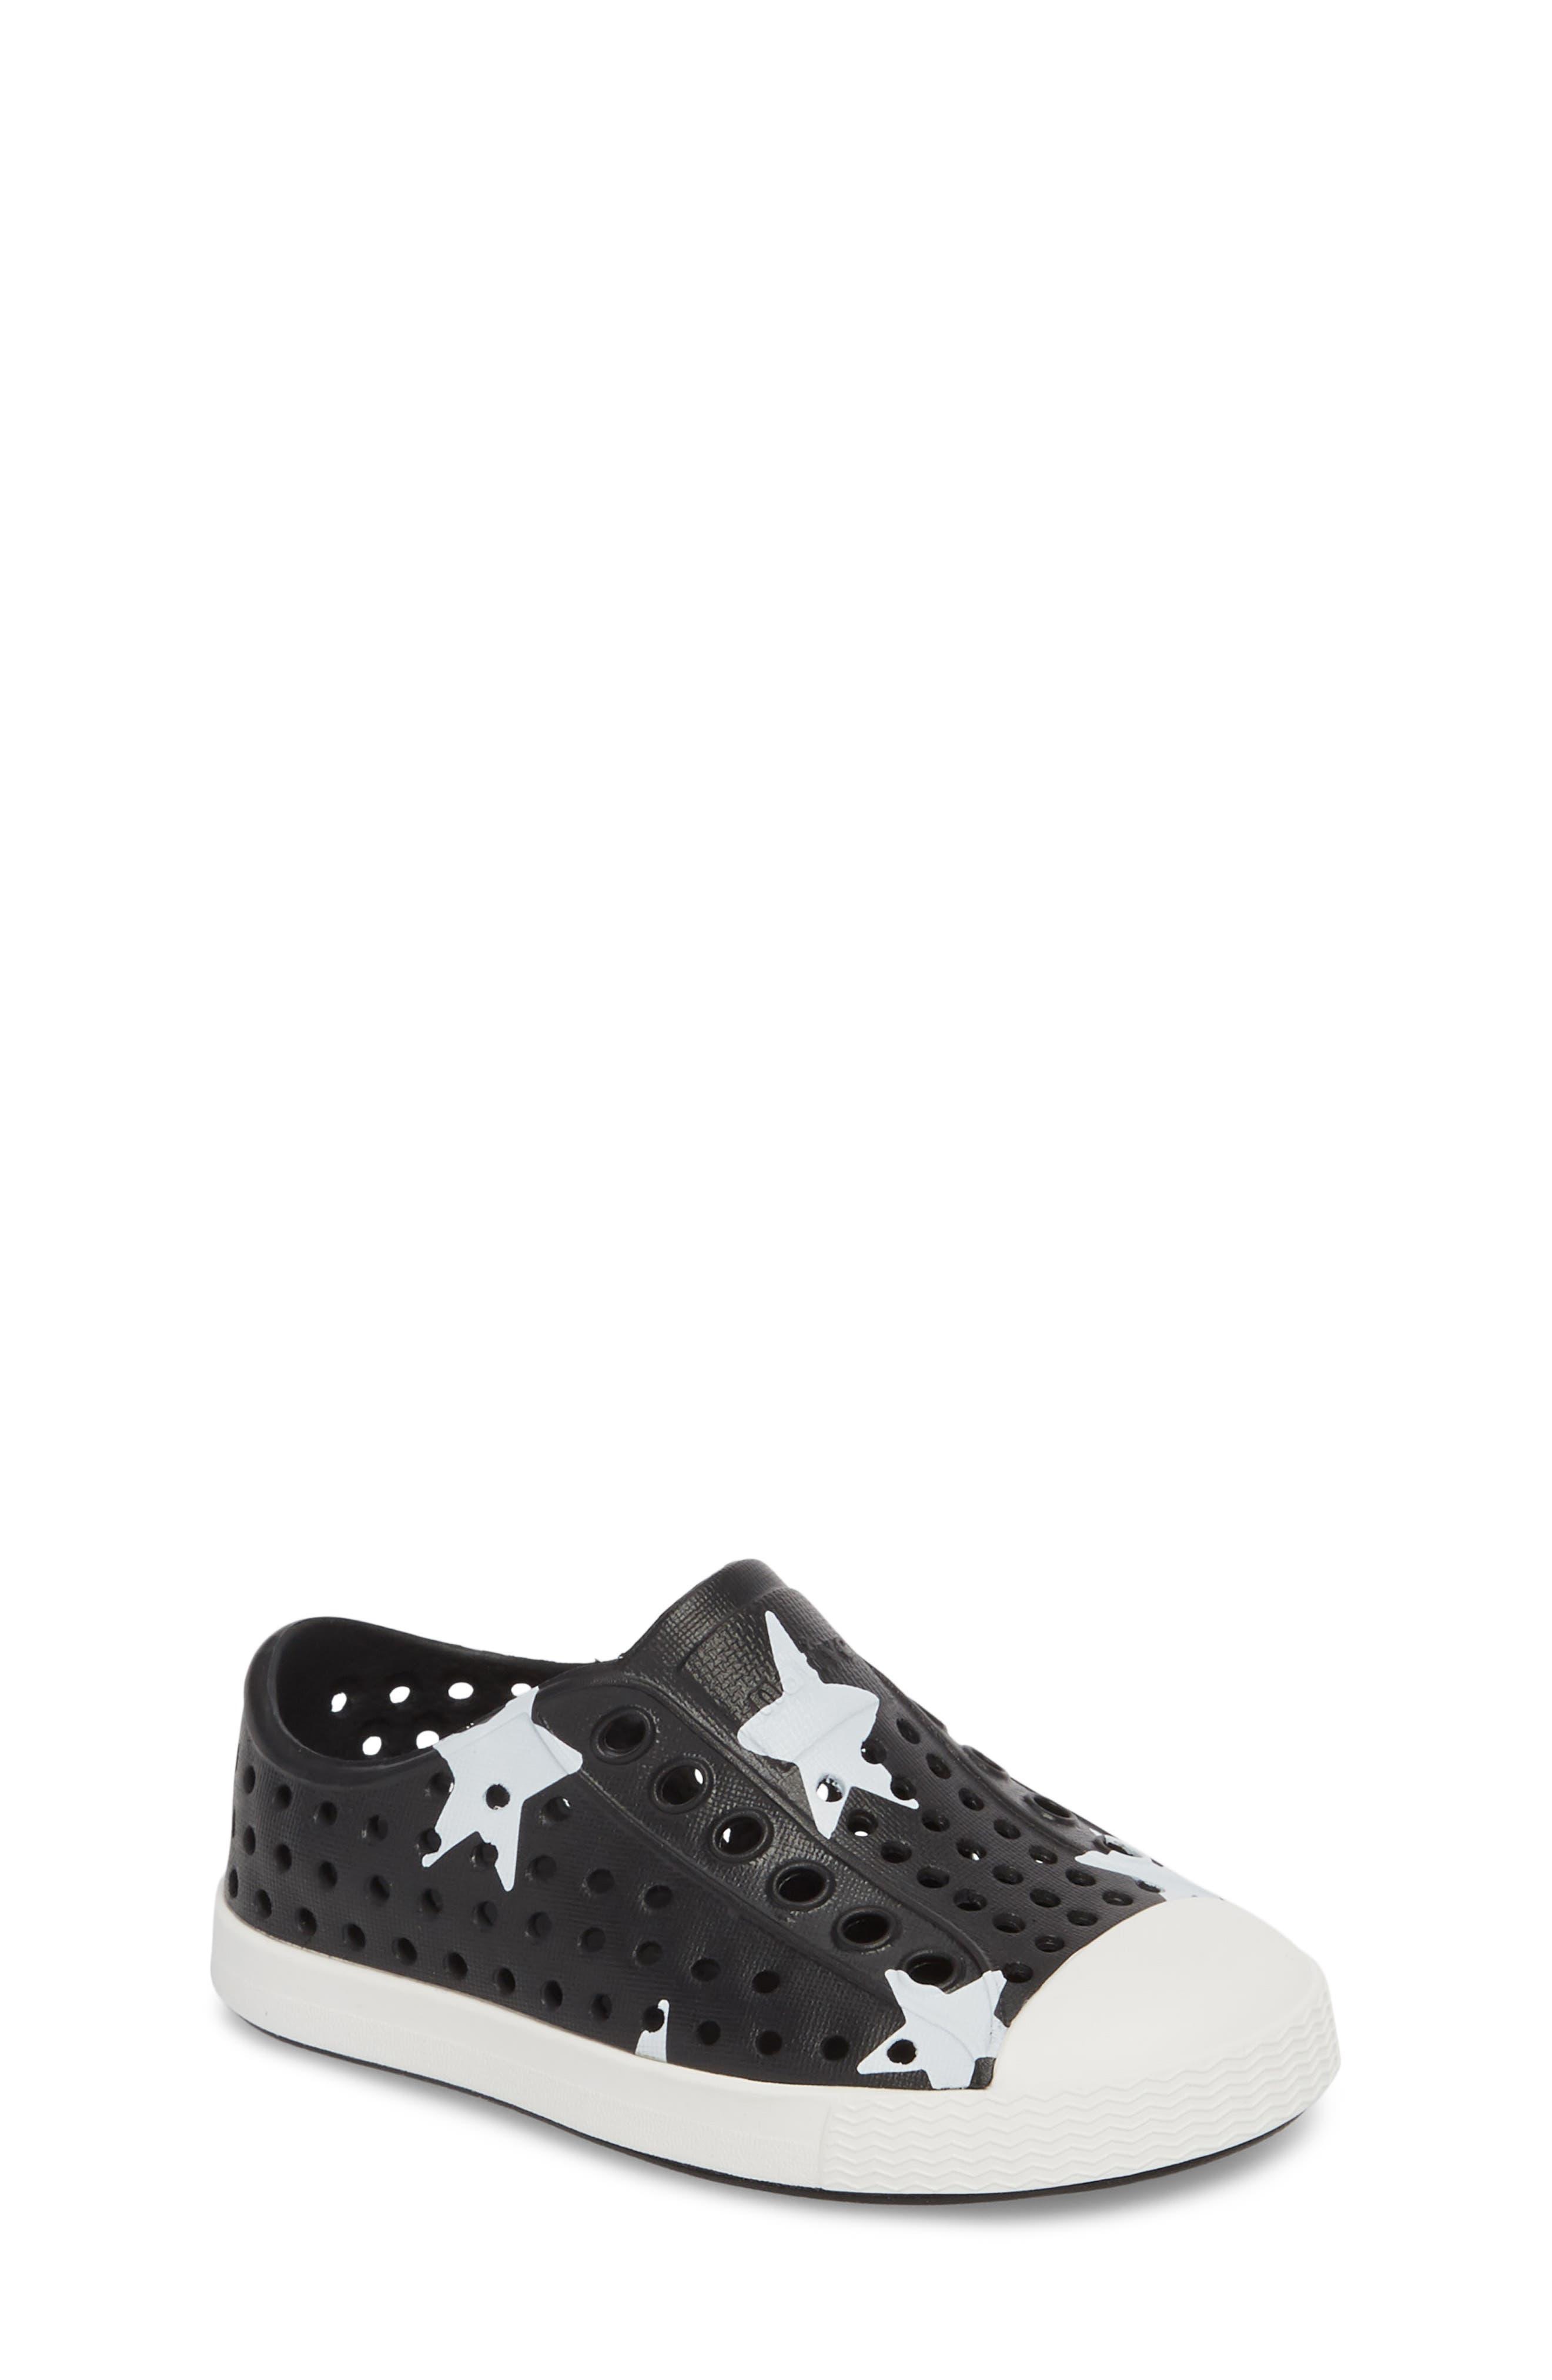 Jefferson Quartz Slip-On Sneaker, Main, color, JIFFY BLACK/ WHITE/ STAR